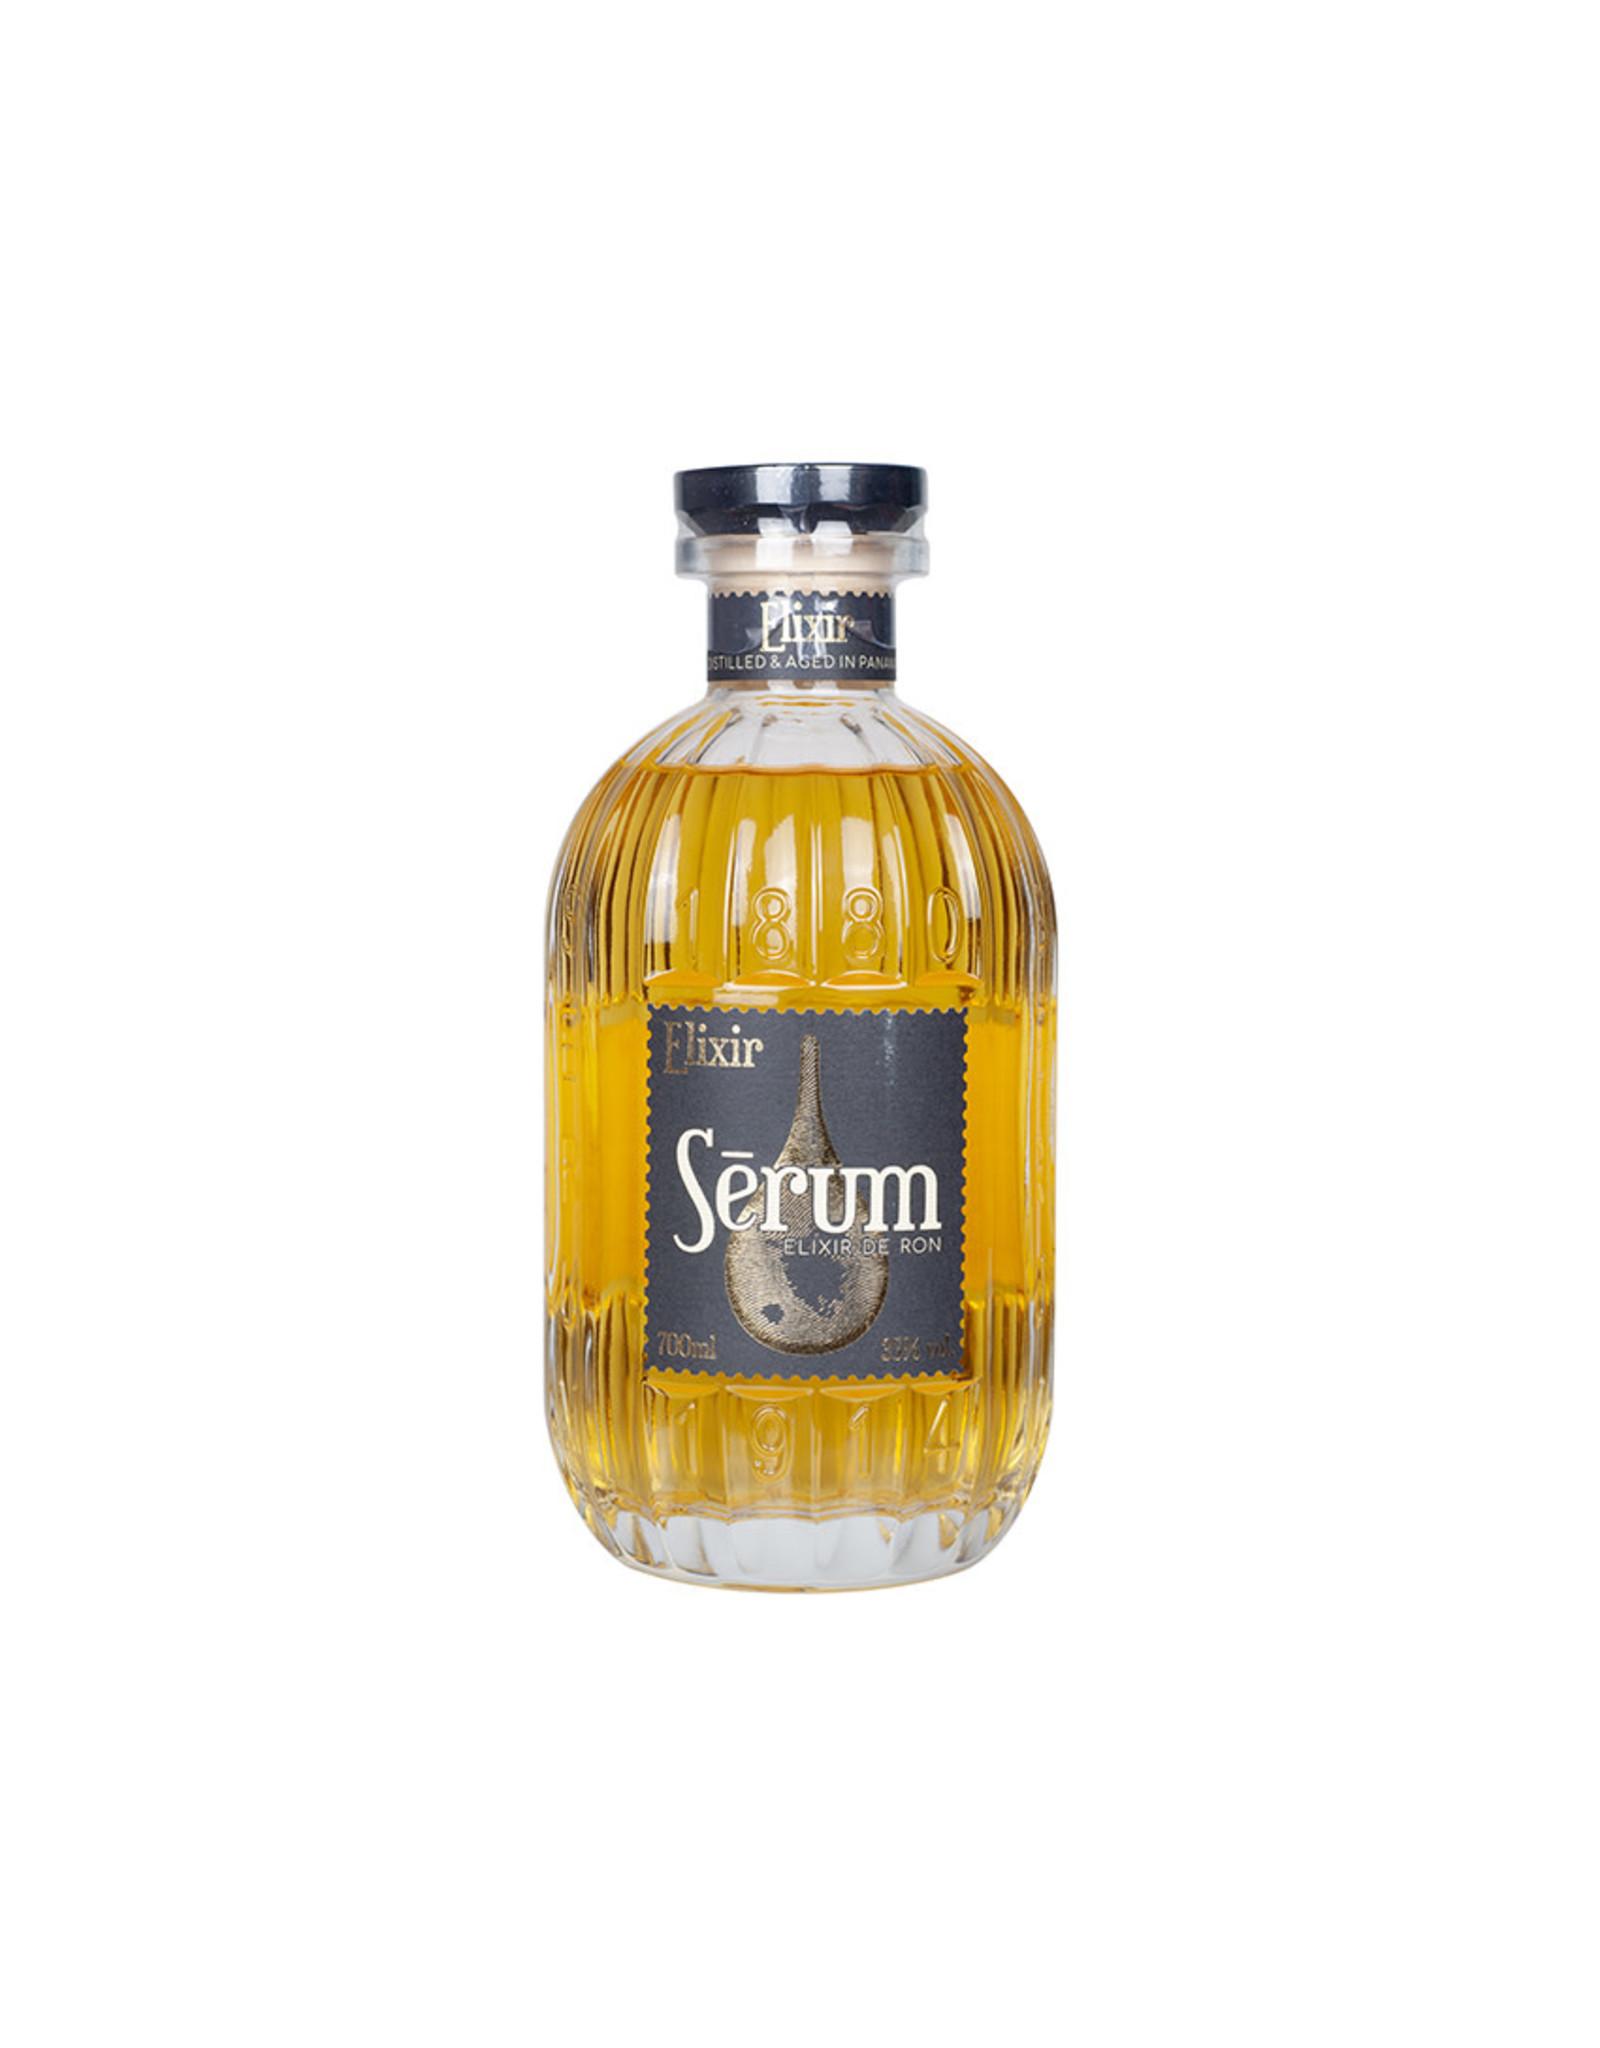 Spirits by Vanguard Serum Ron de Panama Elixir 0.7L 35%